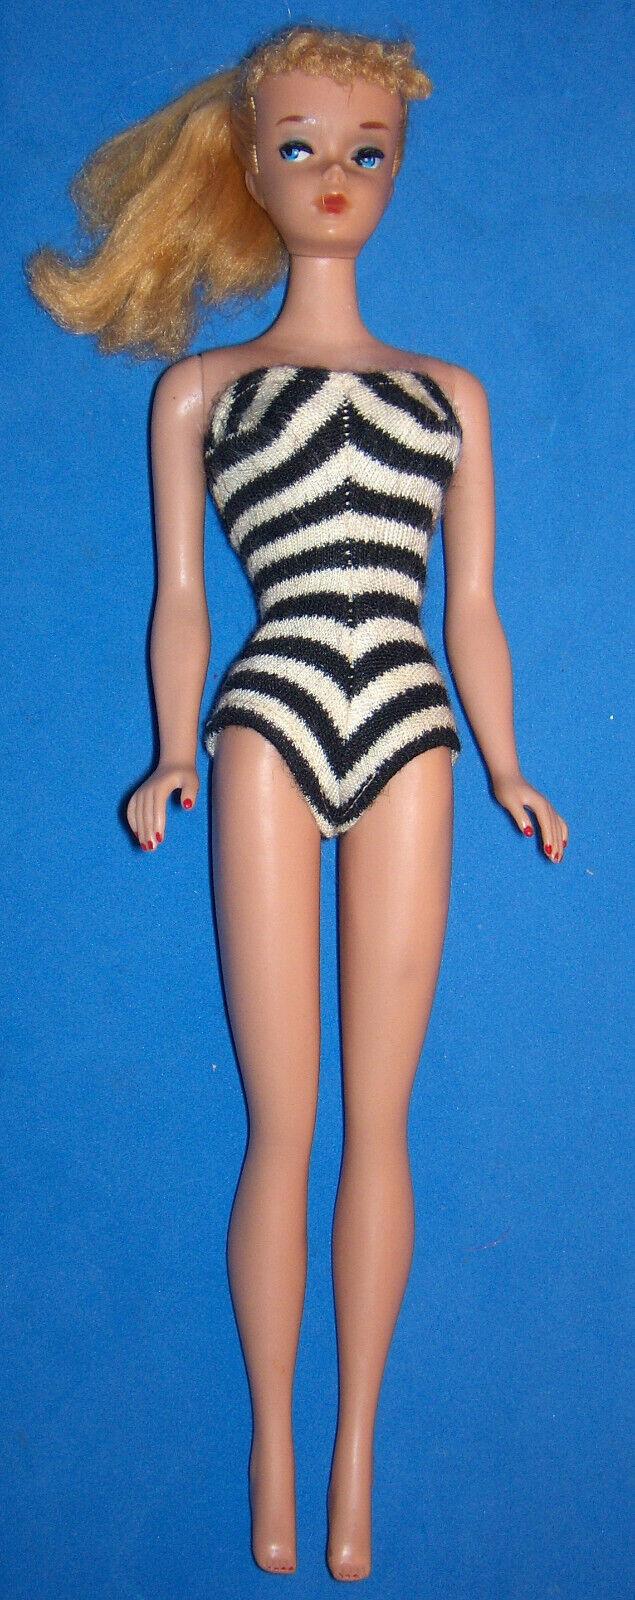 Vintage Rubio Cola de Caballo Barbie Heavy Body TM ™ 1960 OSS Bonito Muñeca